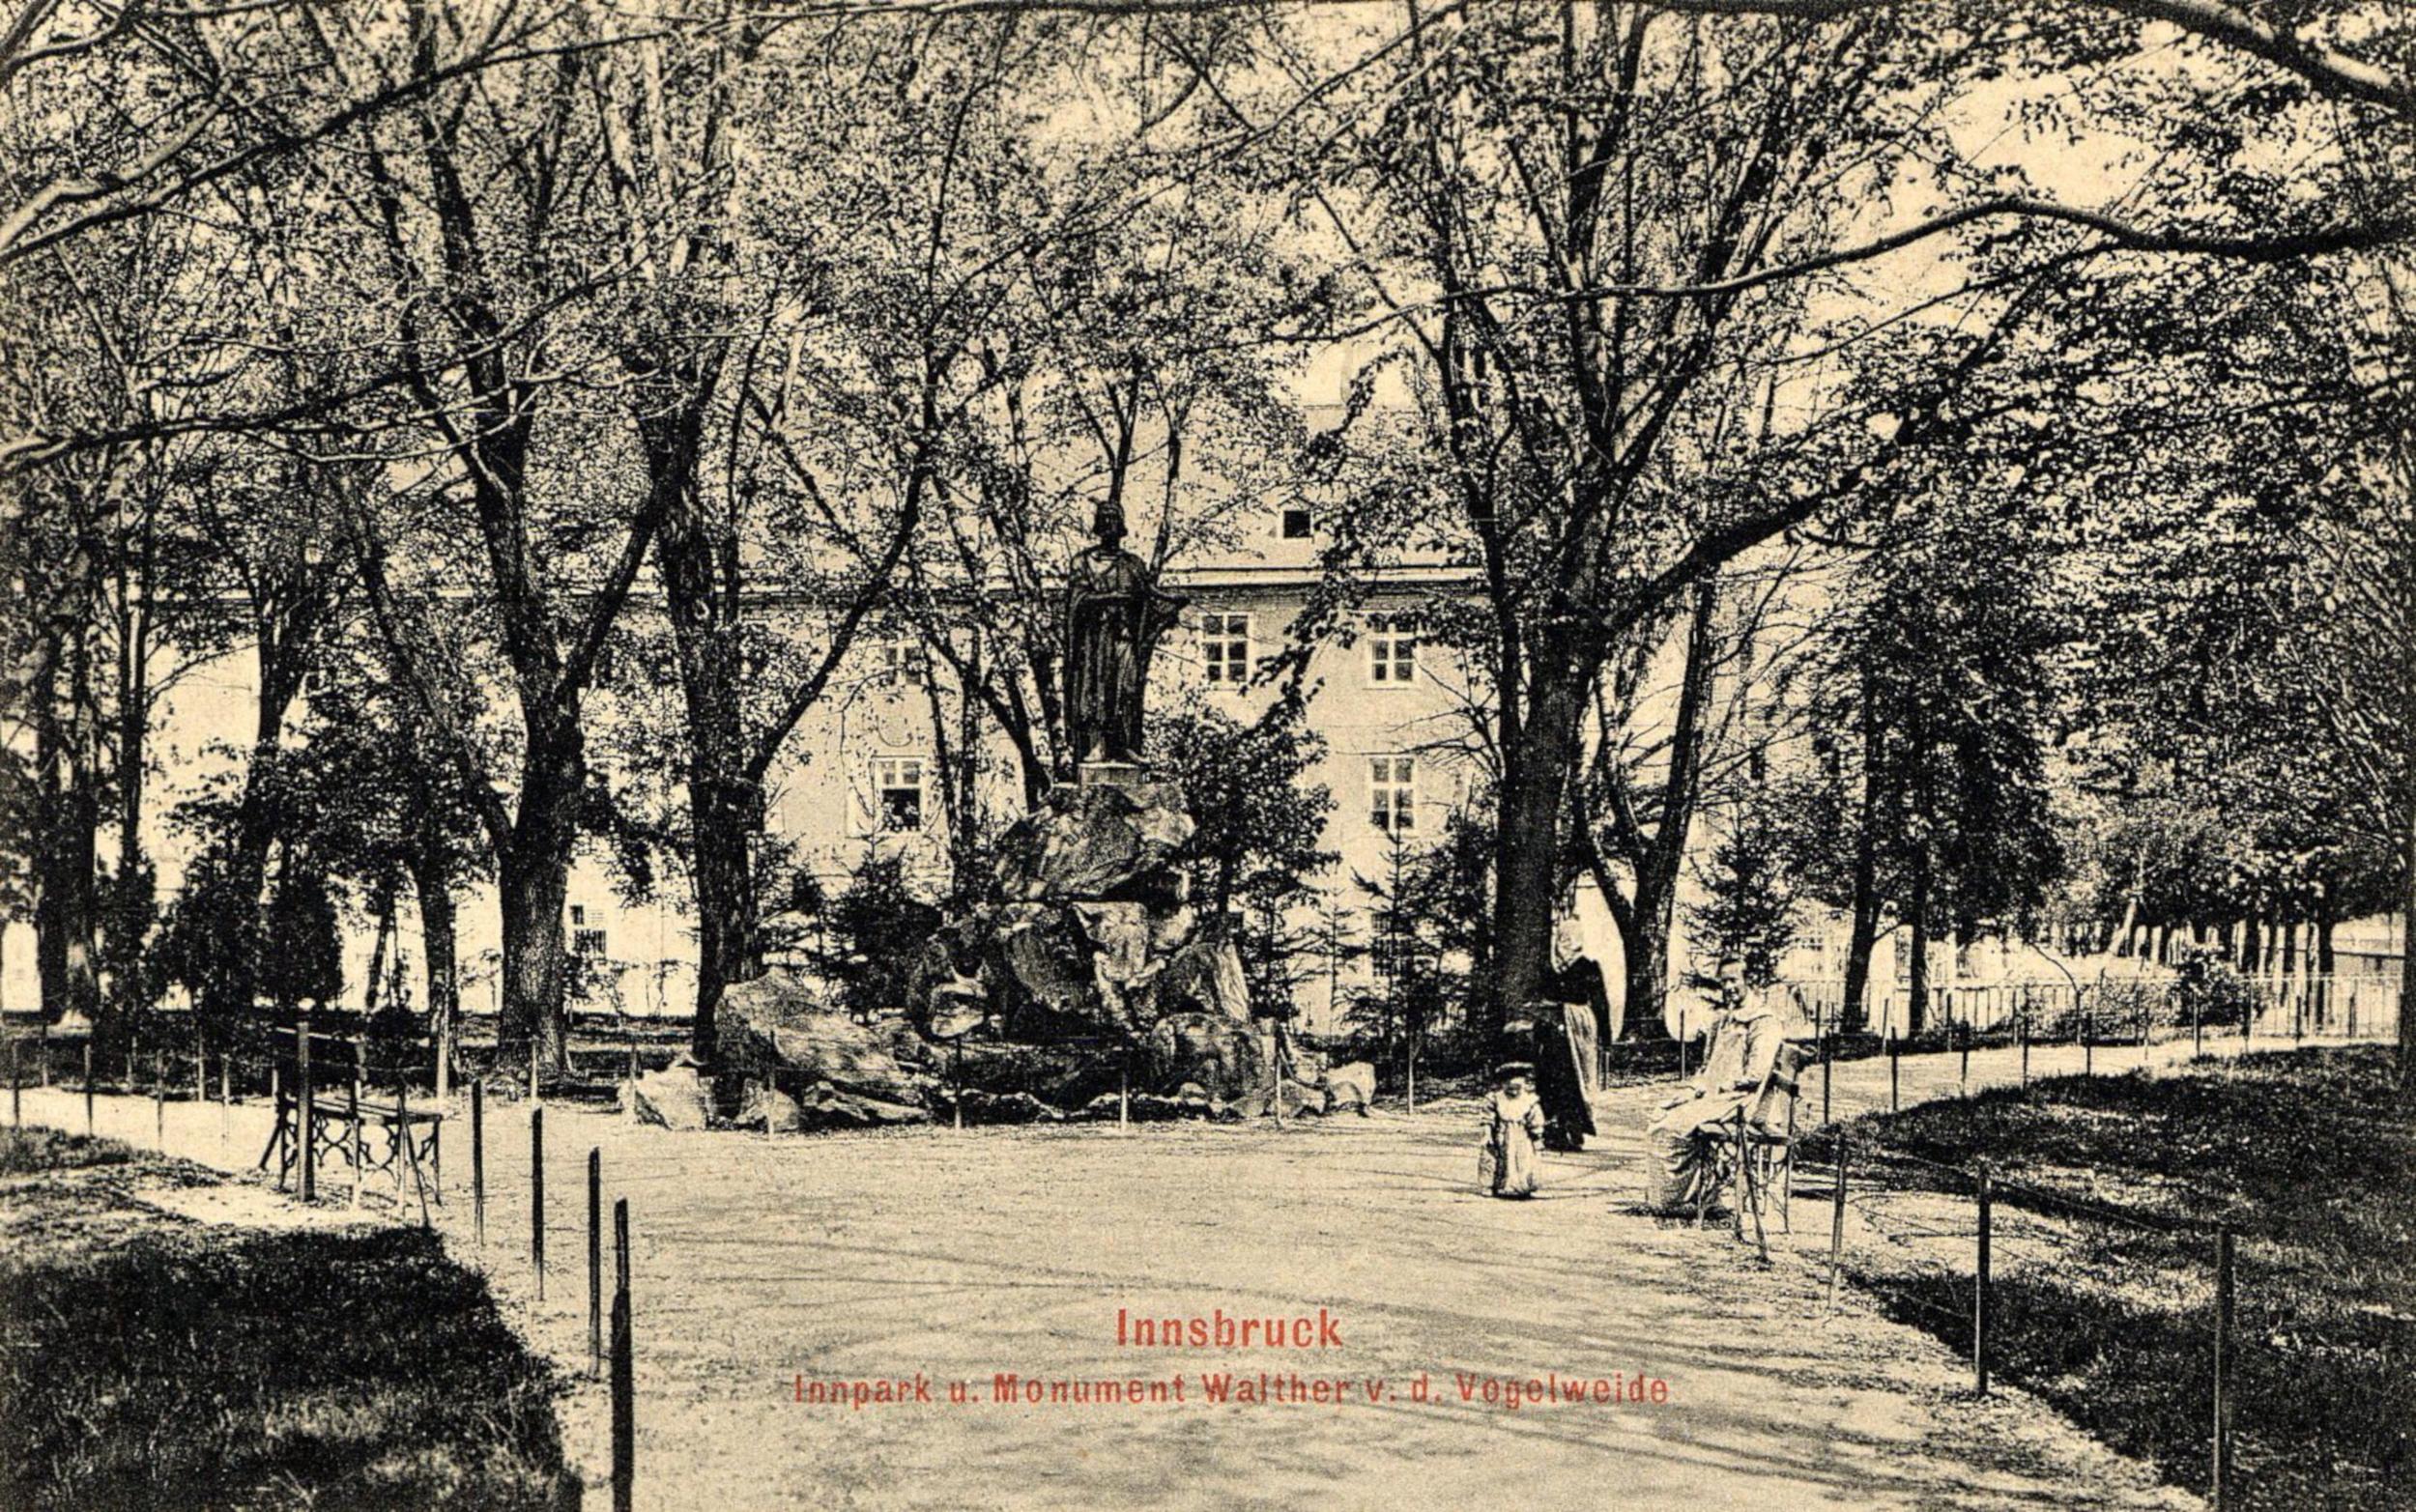 Denkmäler Im Waltherpark, Teil 2